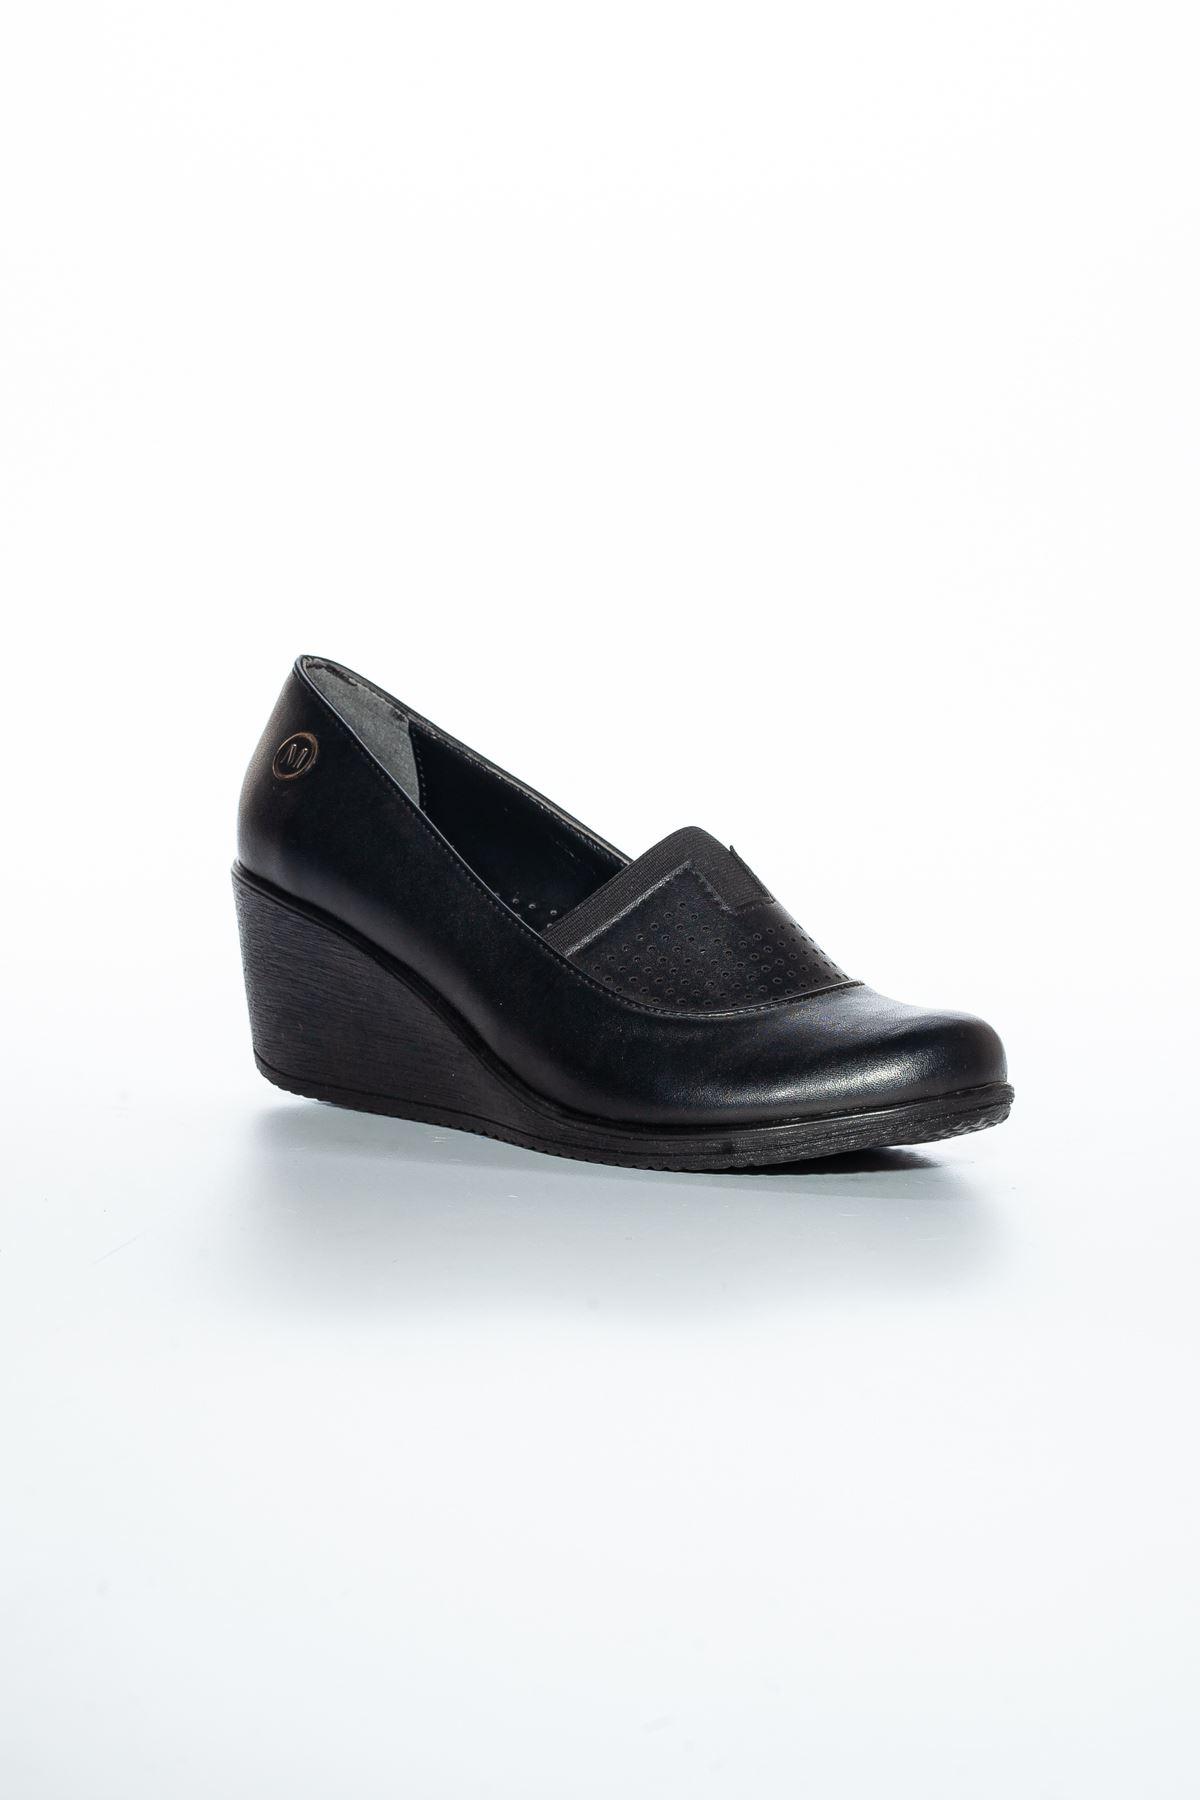 Alka Cilt Ayakkabı Siyah